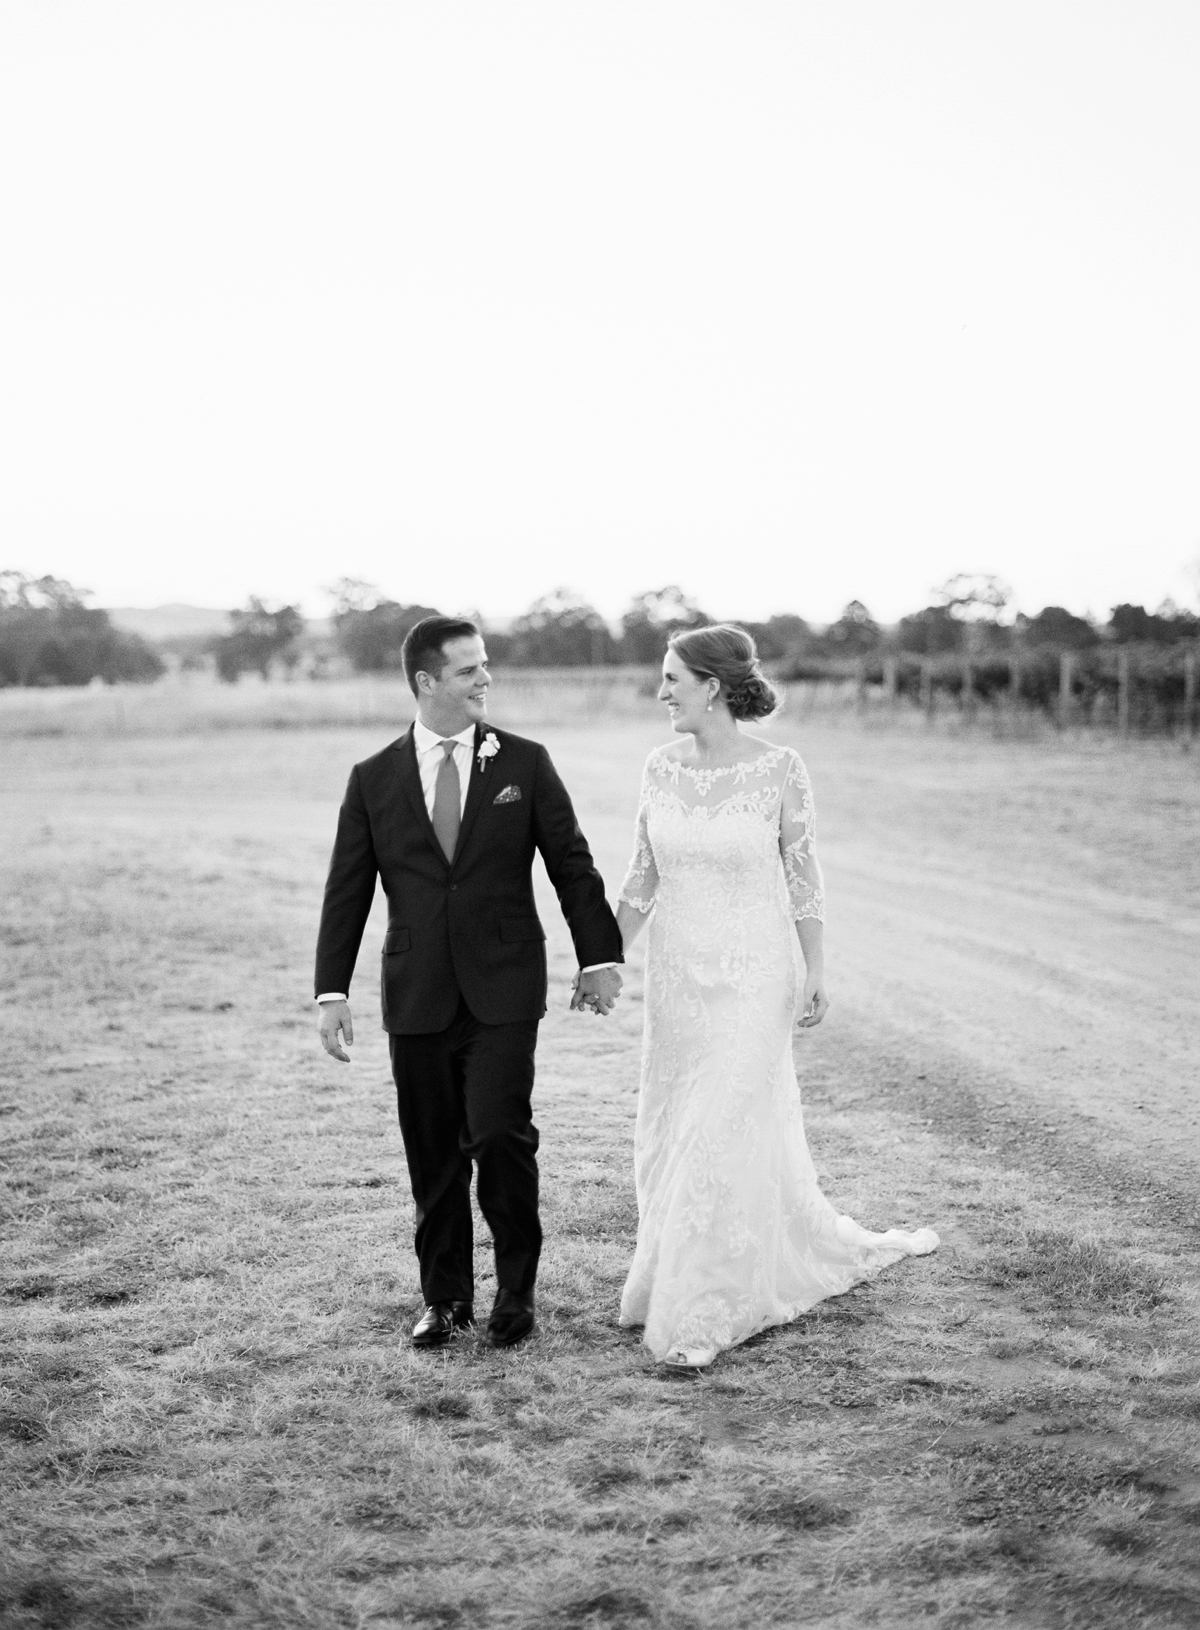 The Vine Grove Mudgee Wedding, Photography by Mr Edwards_1834.jpg